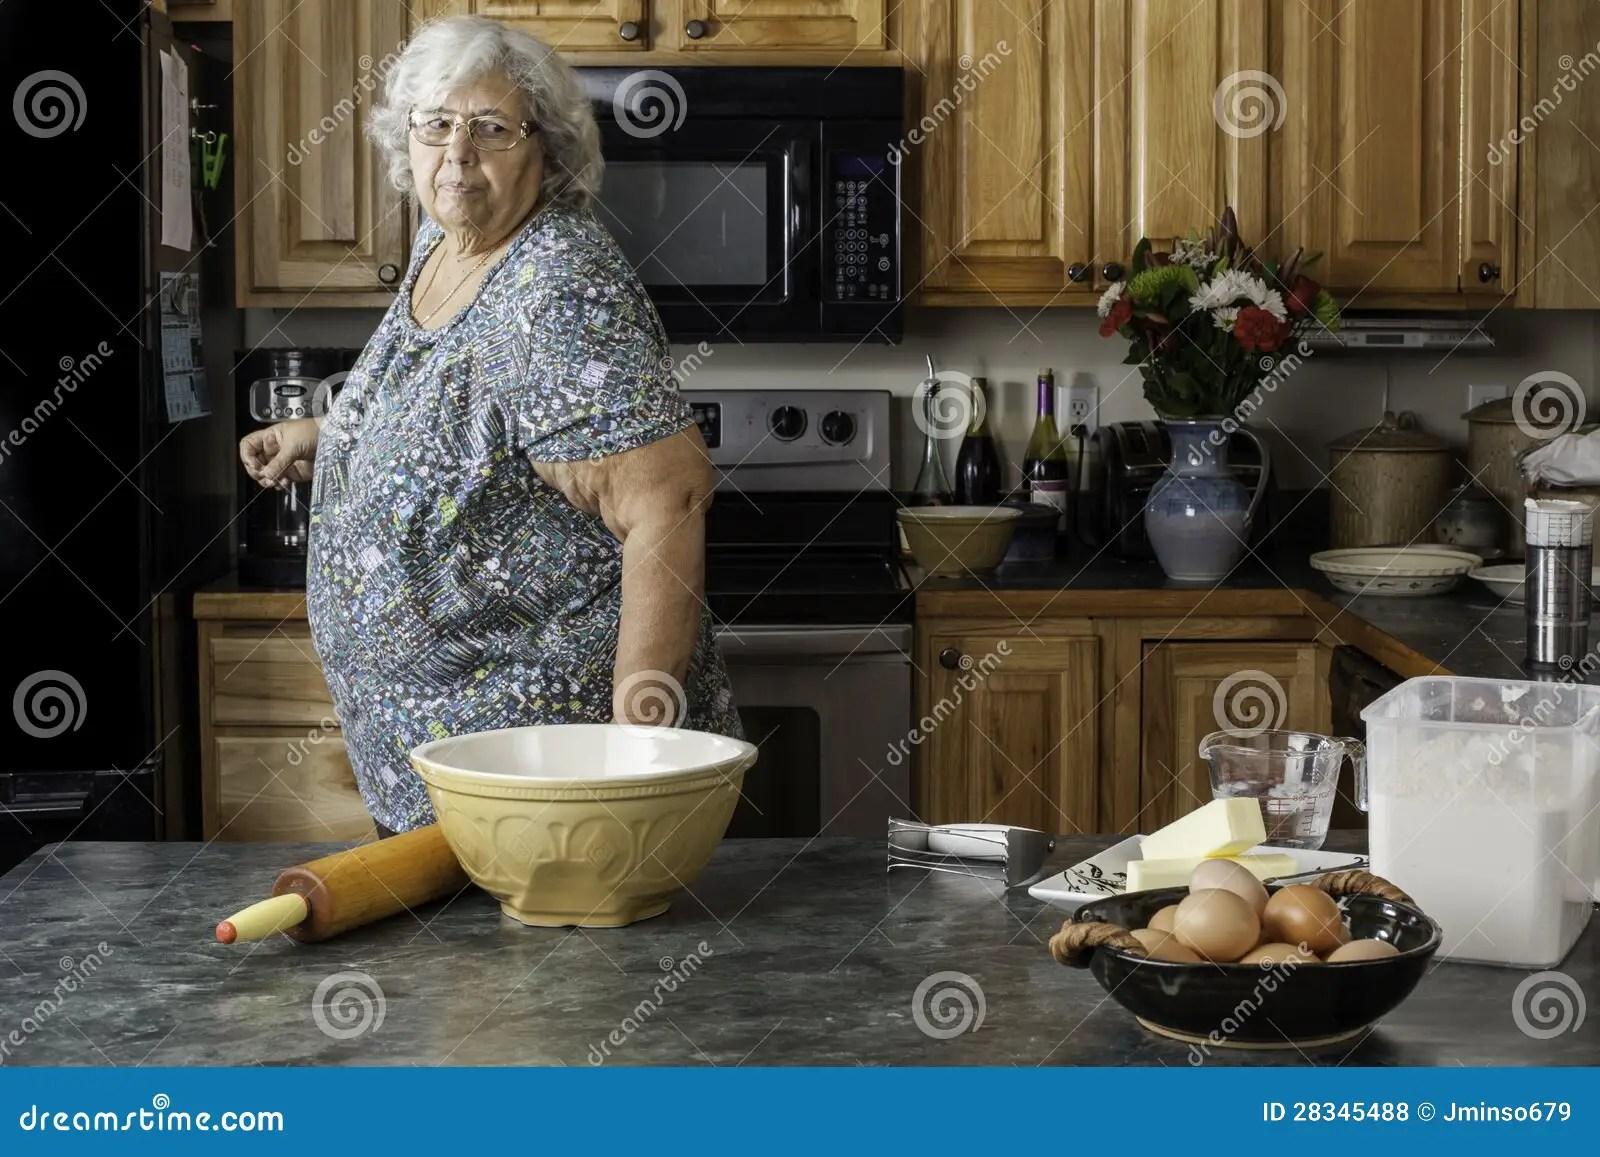 Grandma In A Kitchen Preparing To Bake Stock Photo  Image